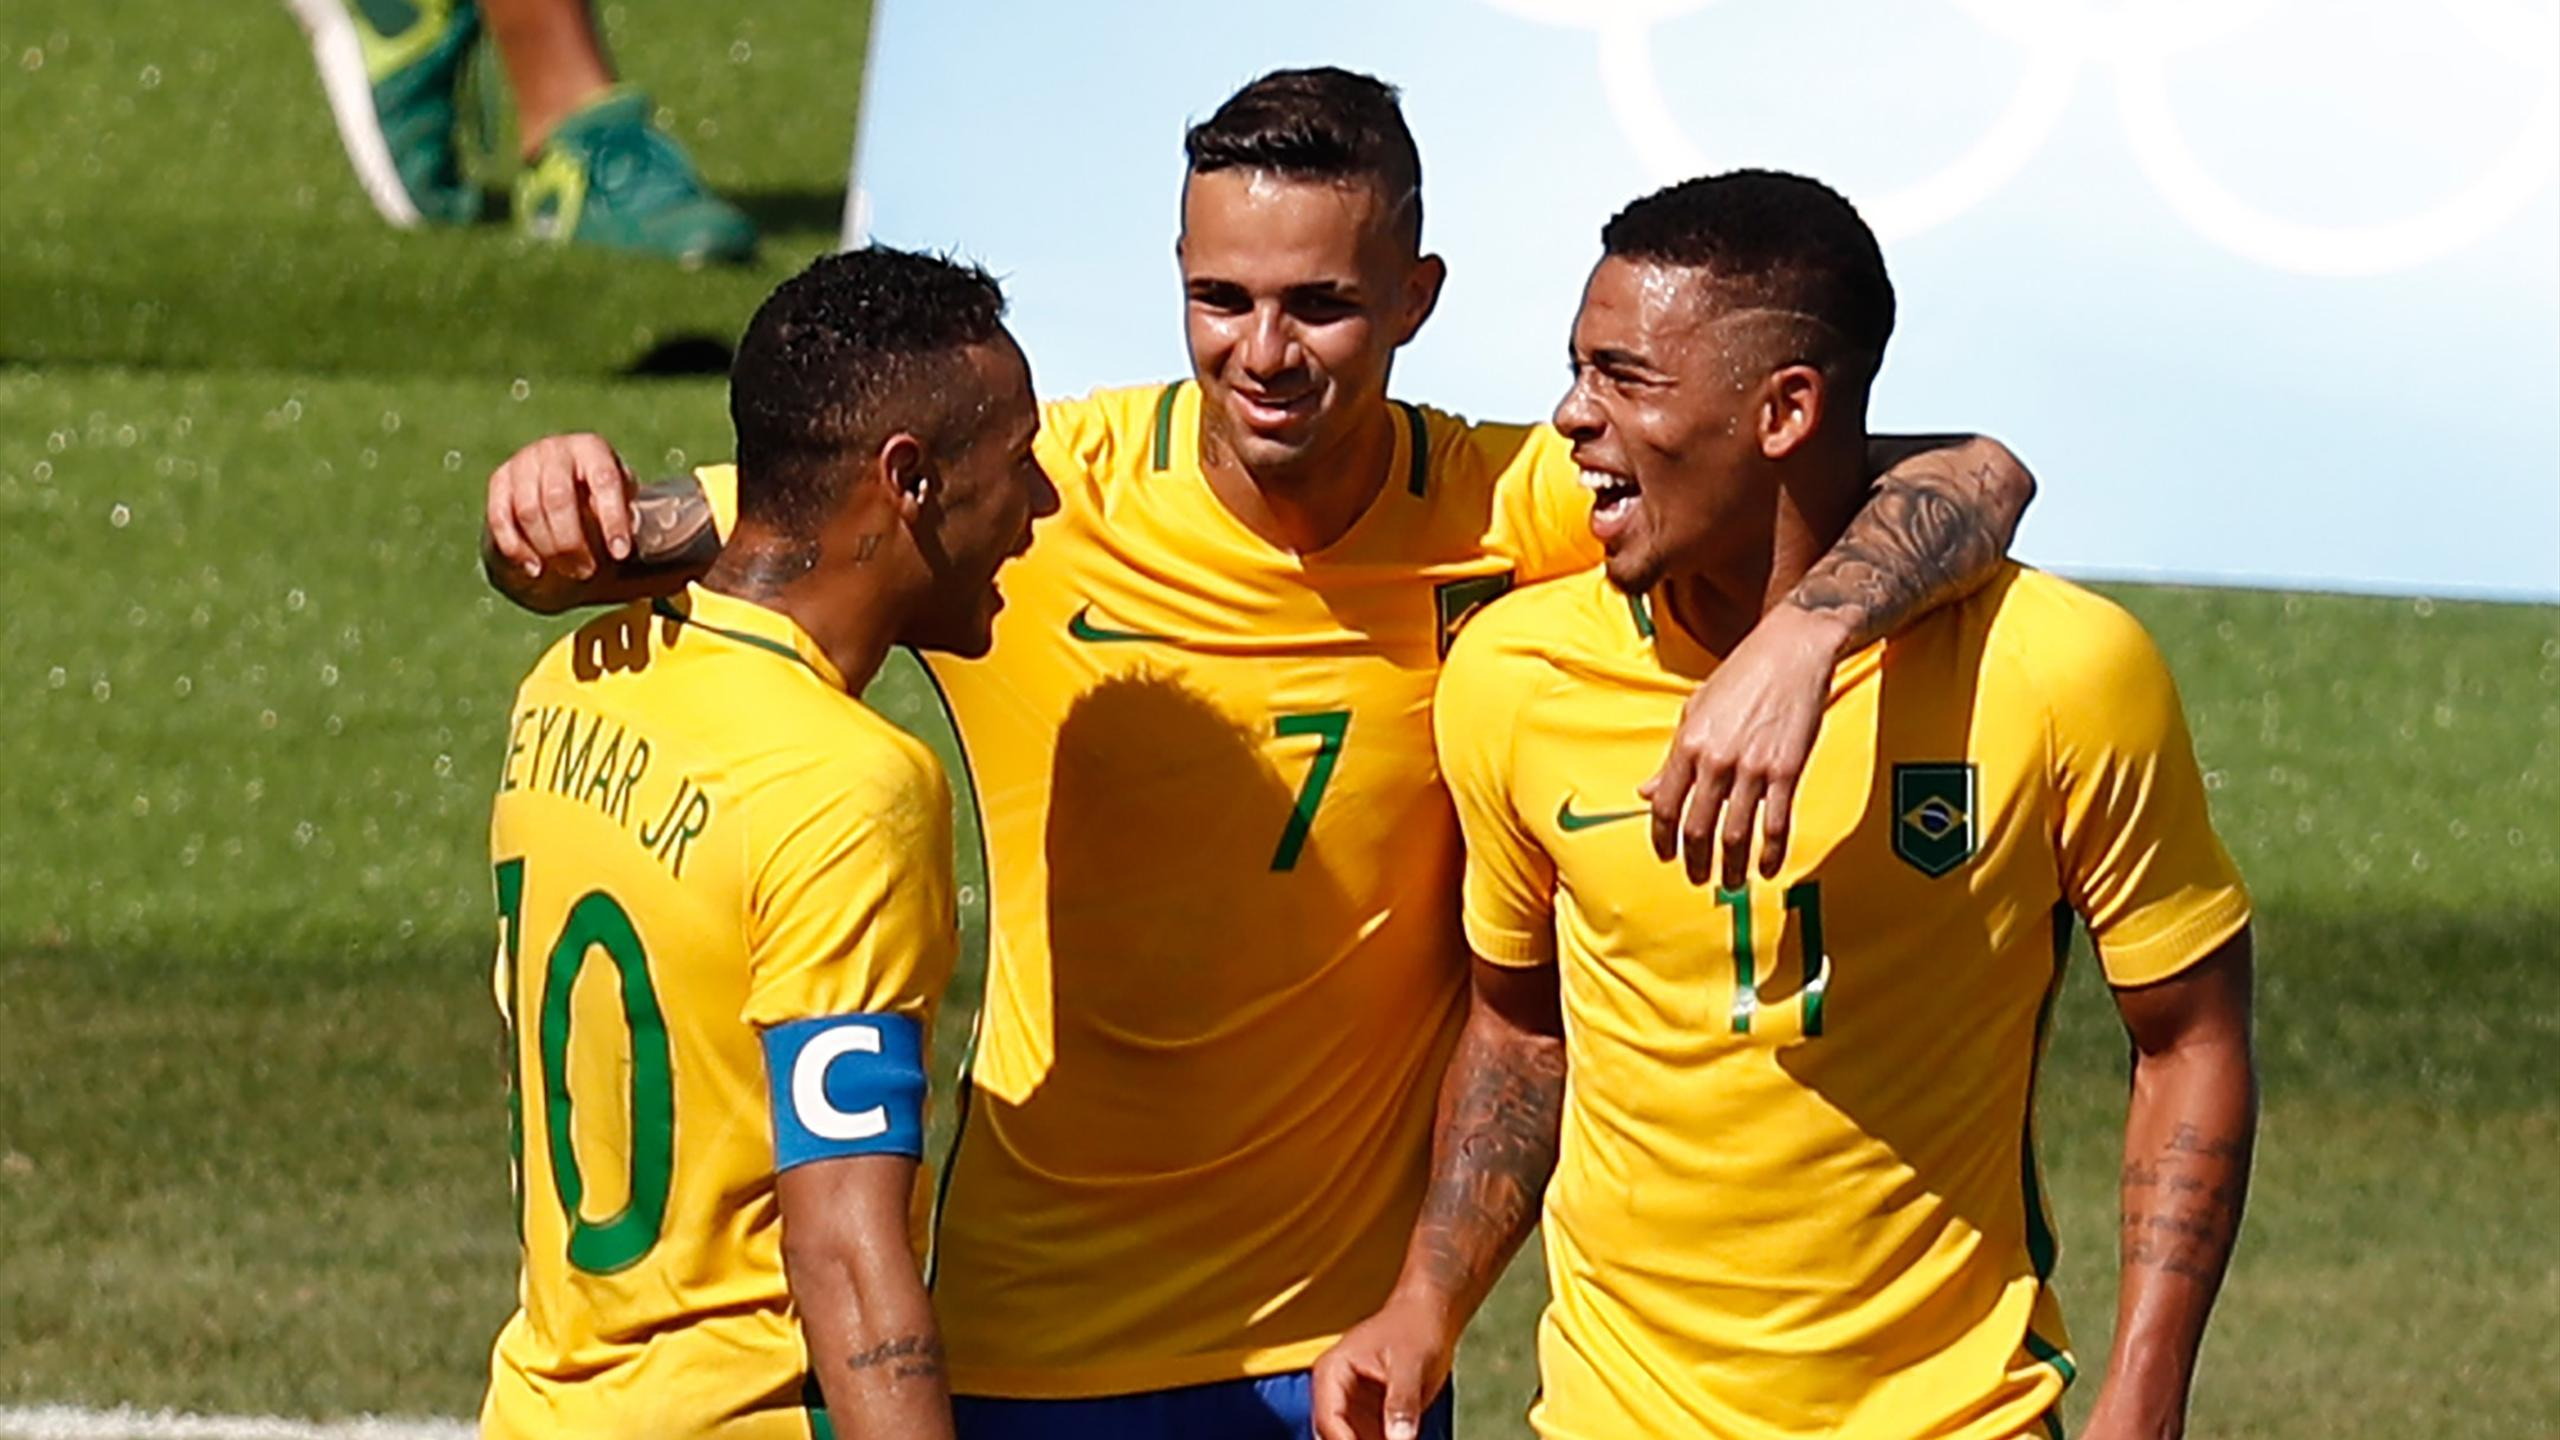 Brazil's Gabriel Jesus (R) celebrates with teammates Neymar (L) and Luan after scoring against Honduras during their Rio 2016 Olympic Games men's football semifinal match at the Maracana stadium in Rio de Janeiro